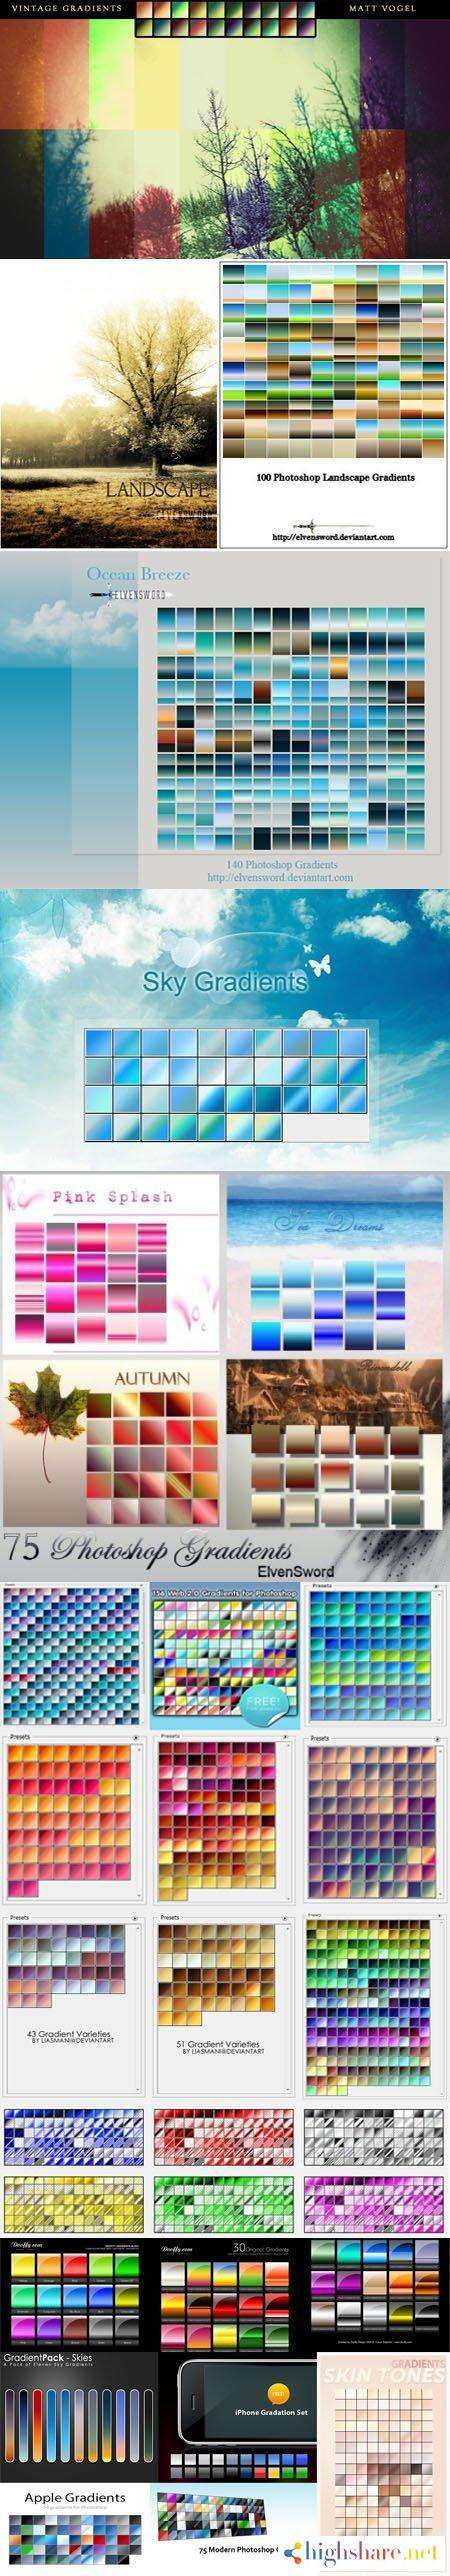 5000 photoshop gradients for designers 5f49f7cdb9b8c - 5000+ Photoshop Gradients for Designers